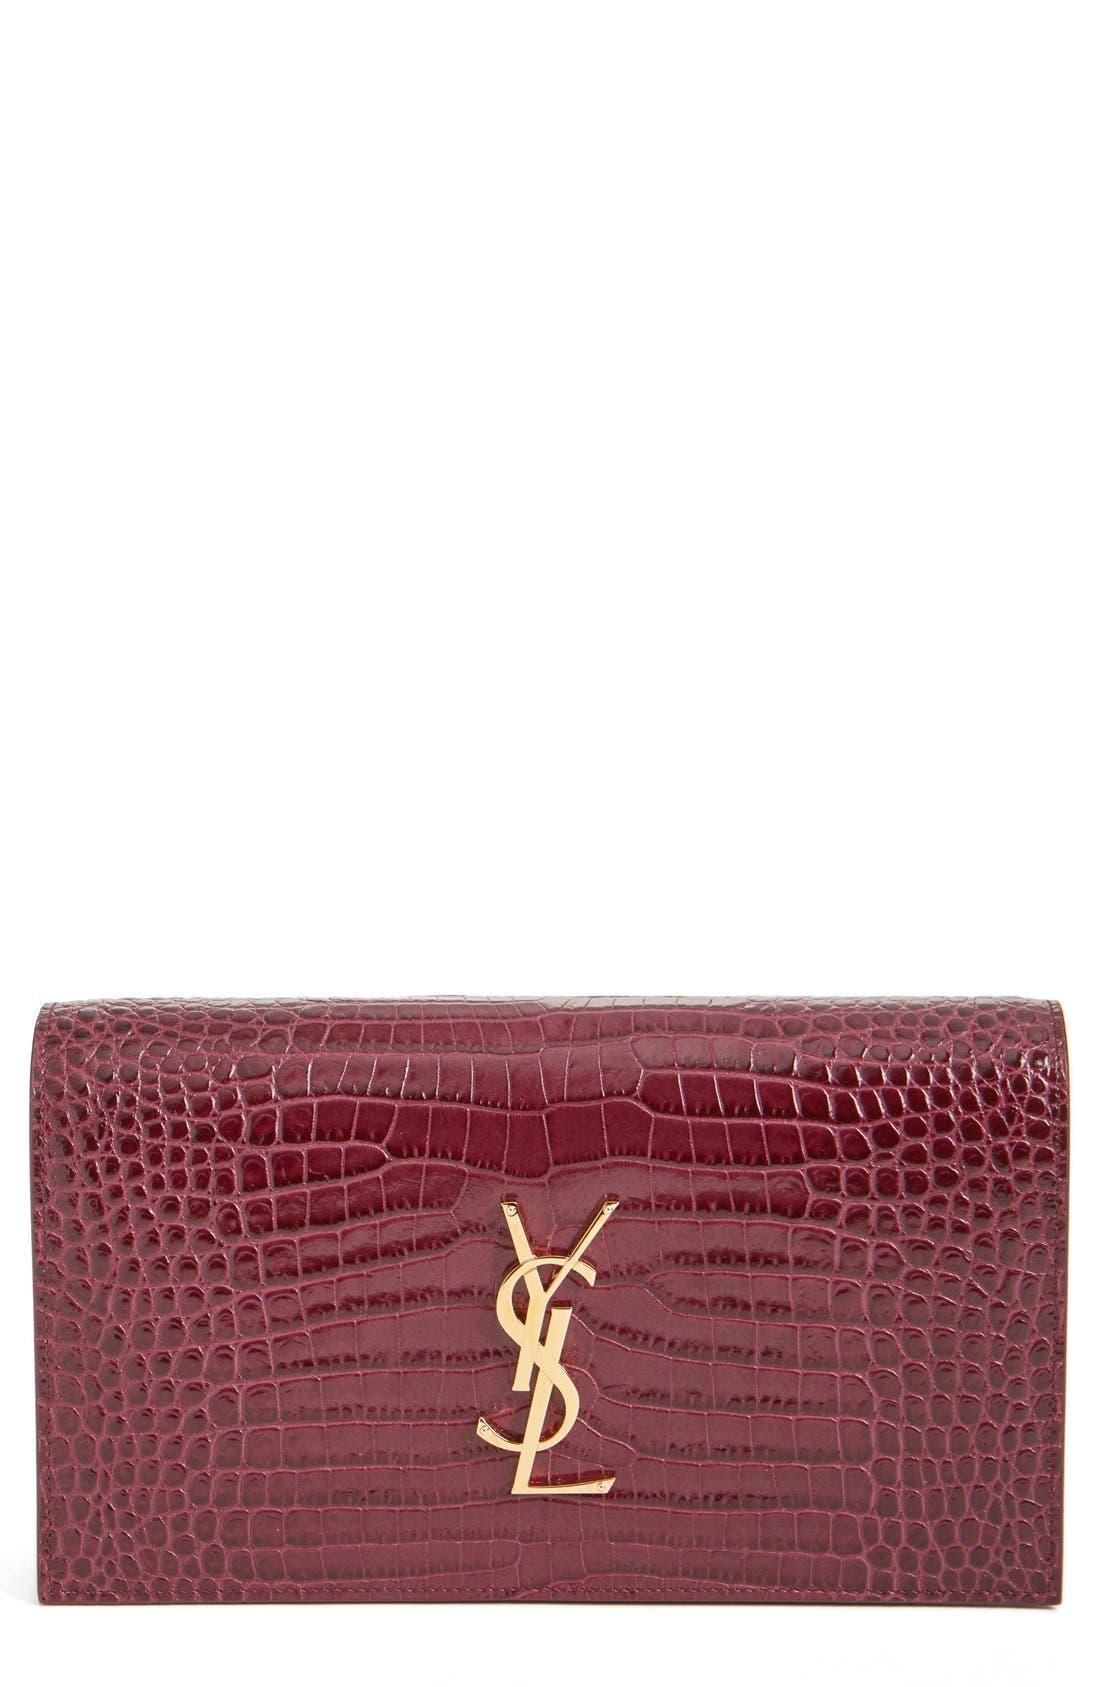 Alternate Image 1 Selected - Saint Laurent 'Kate' Croc Embossed Calfskin Leather Clutch